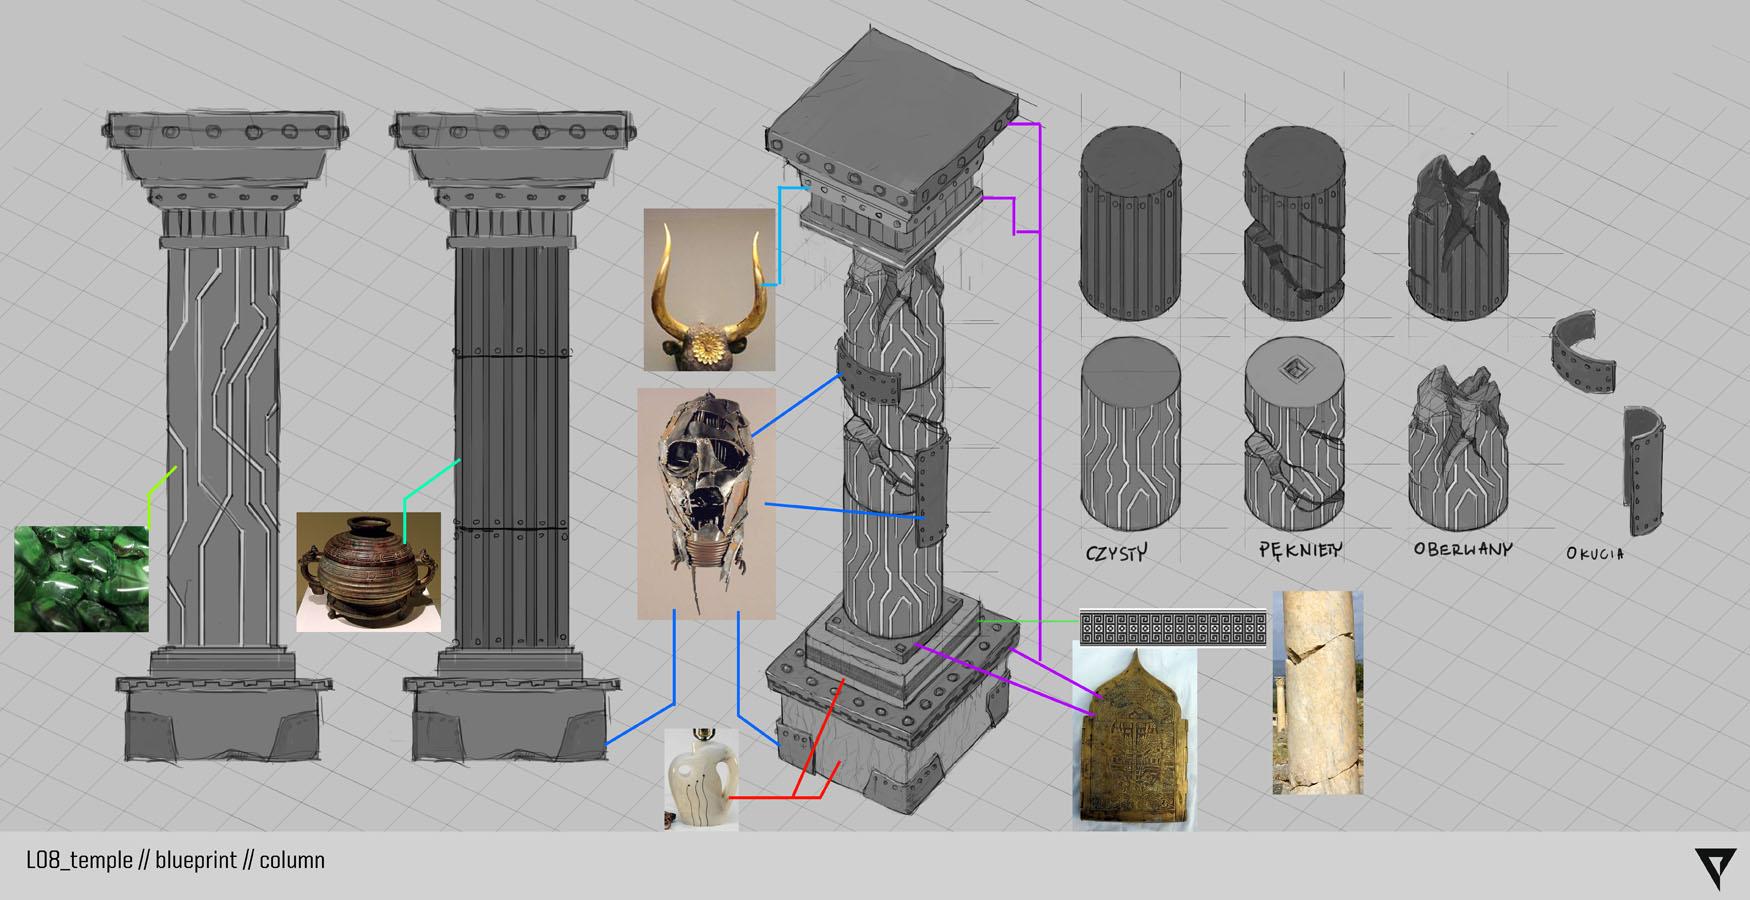 L08_temple_blueprint_column 1.jpg